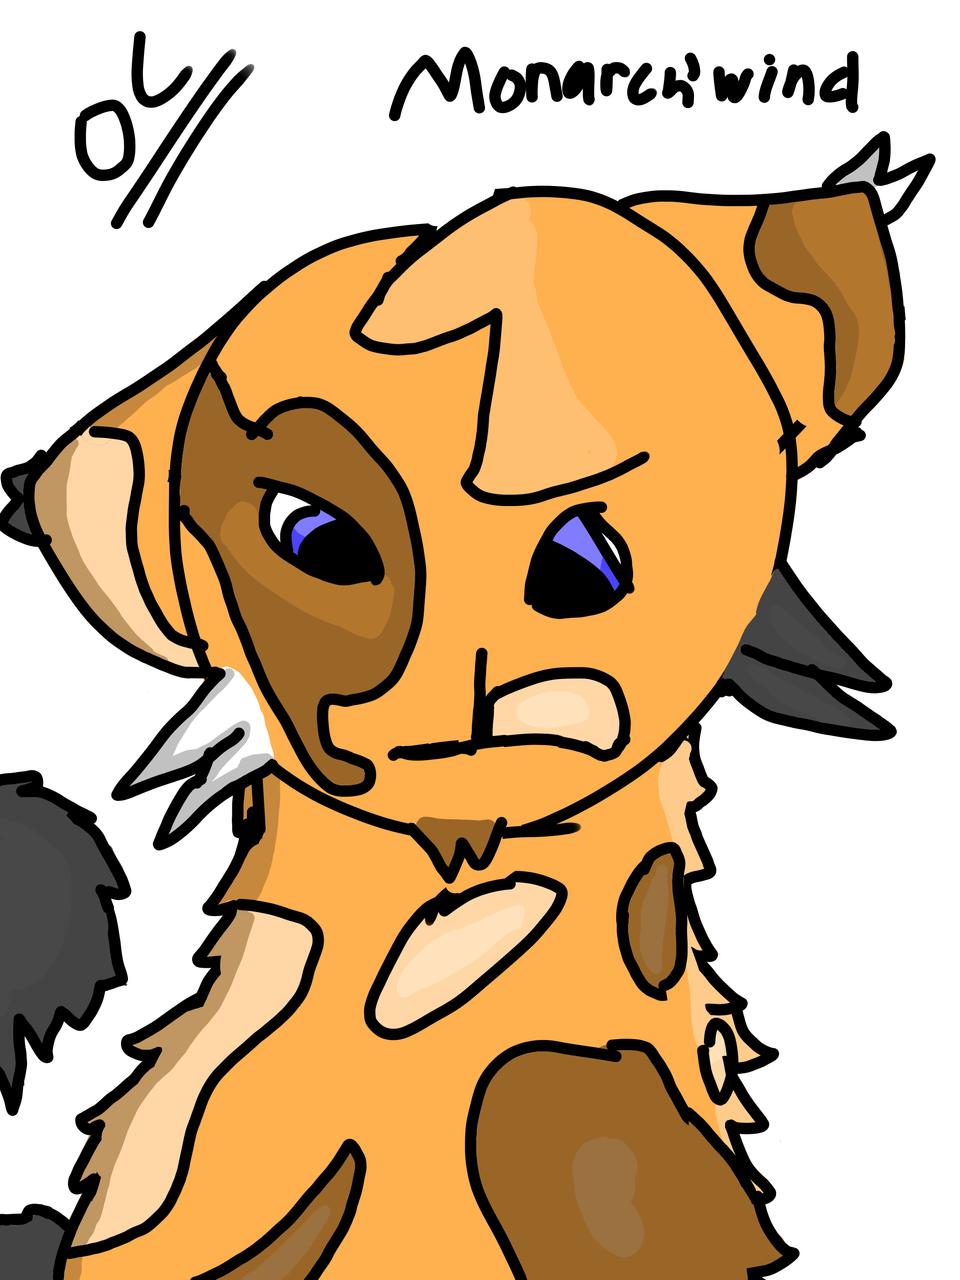 Monarch'Wind Illust of Maple medibangpaint warriorcats Monarchwind warriorcatsoc warriors oc notatwin Wrongname Maple